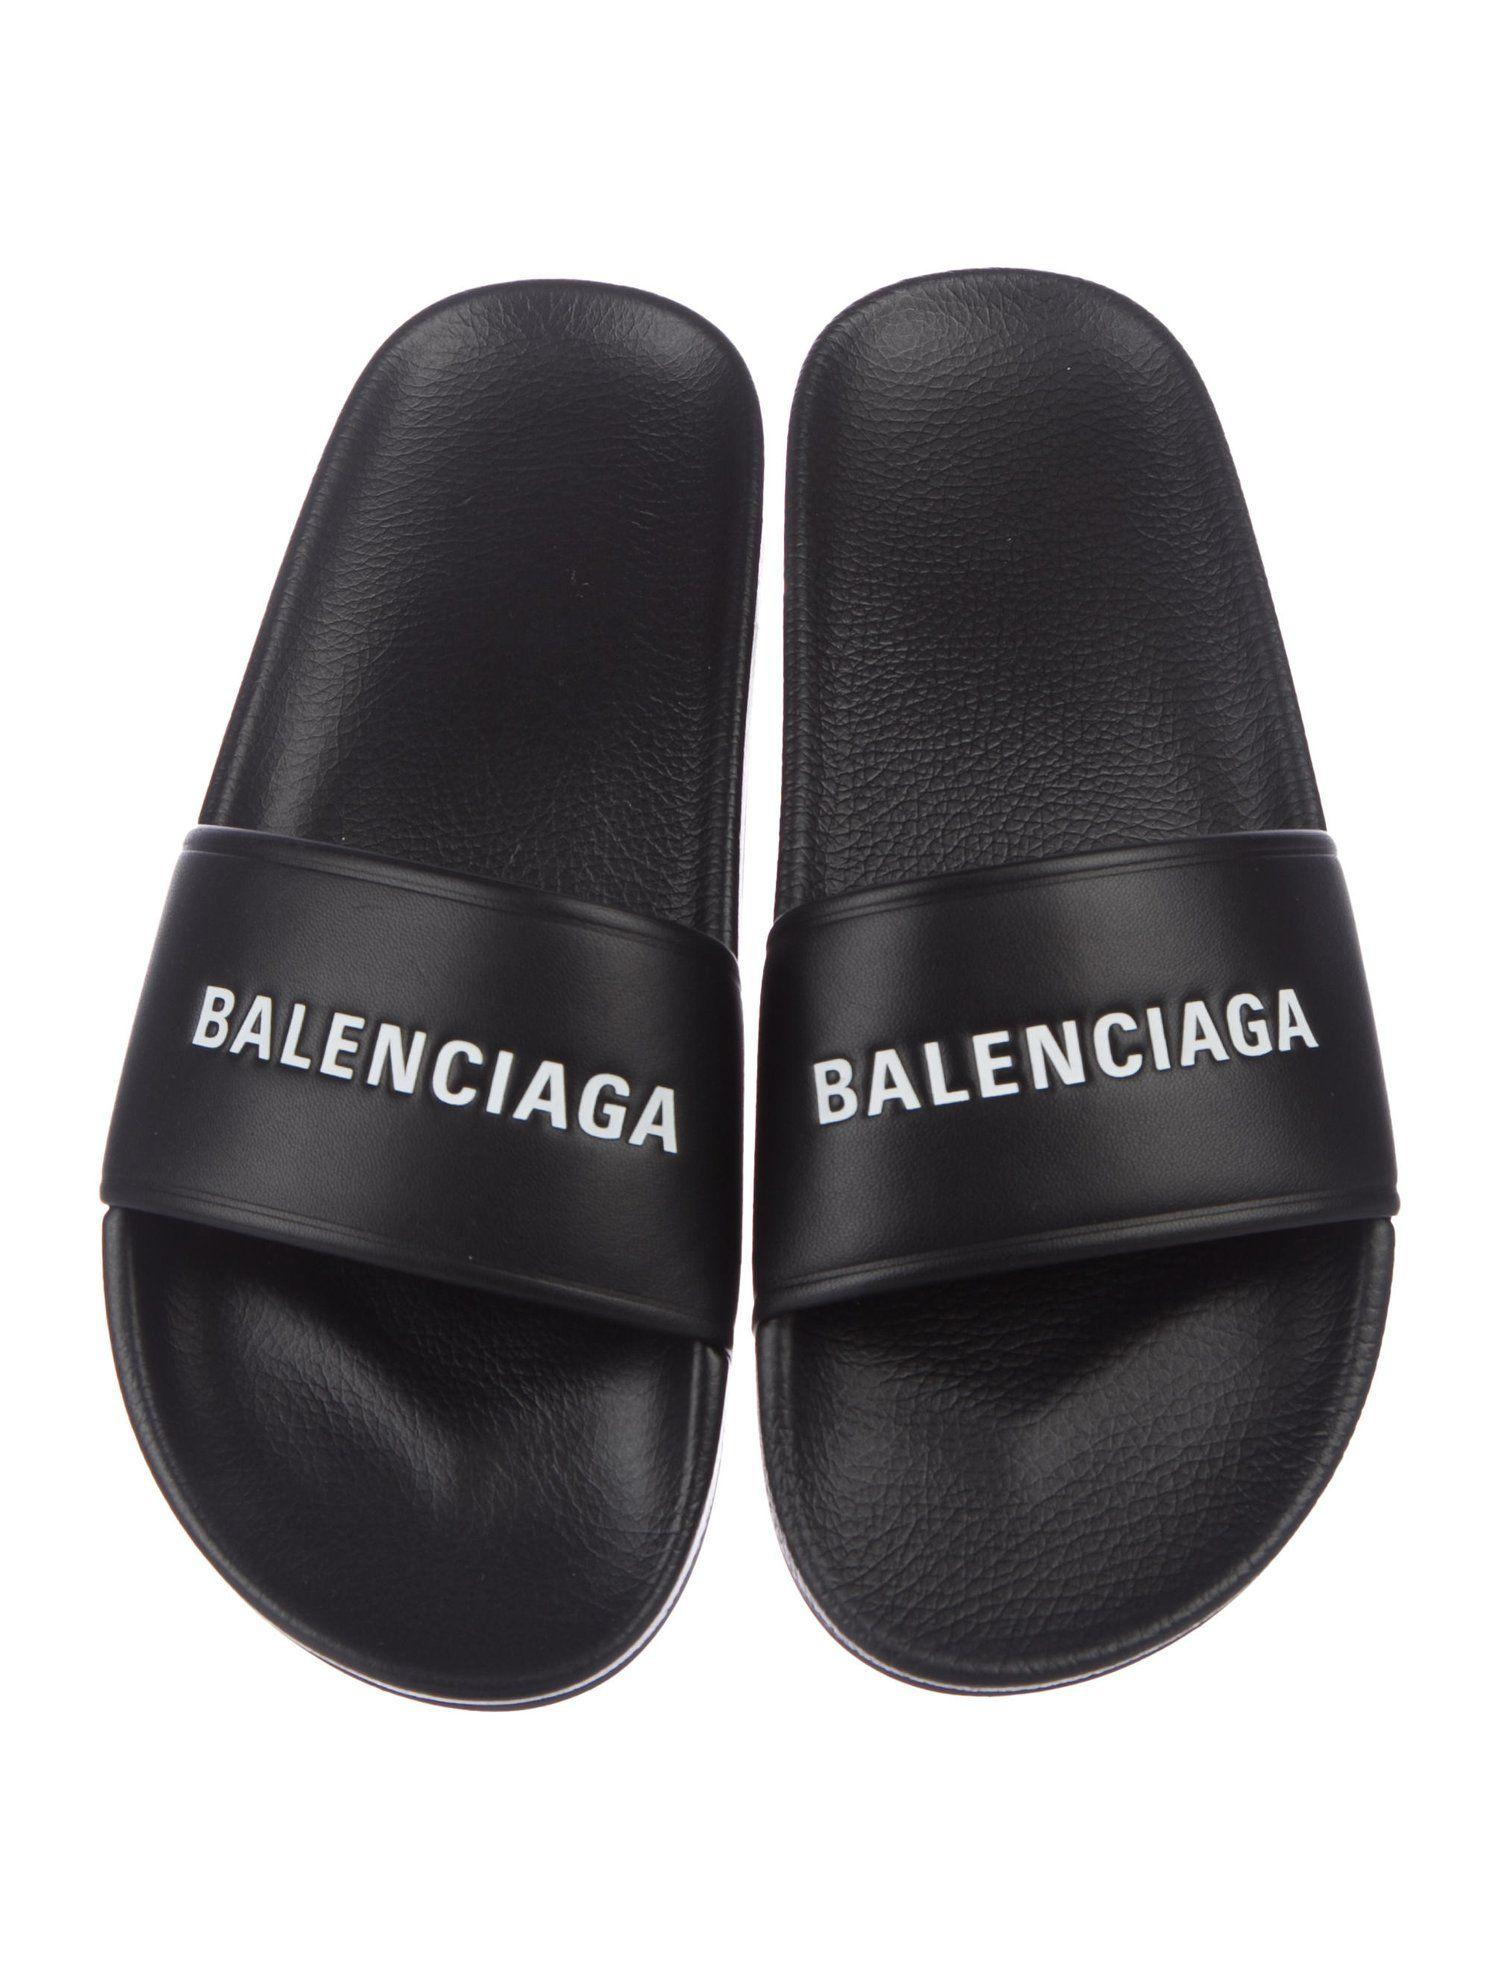 Balenciaga 2018 Pool Logo Sandals